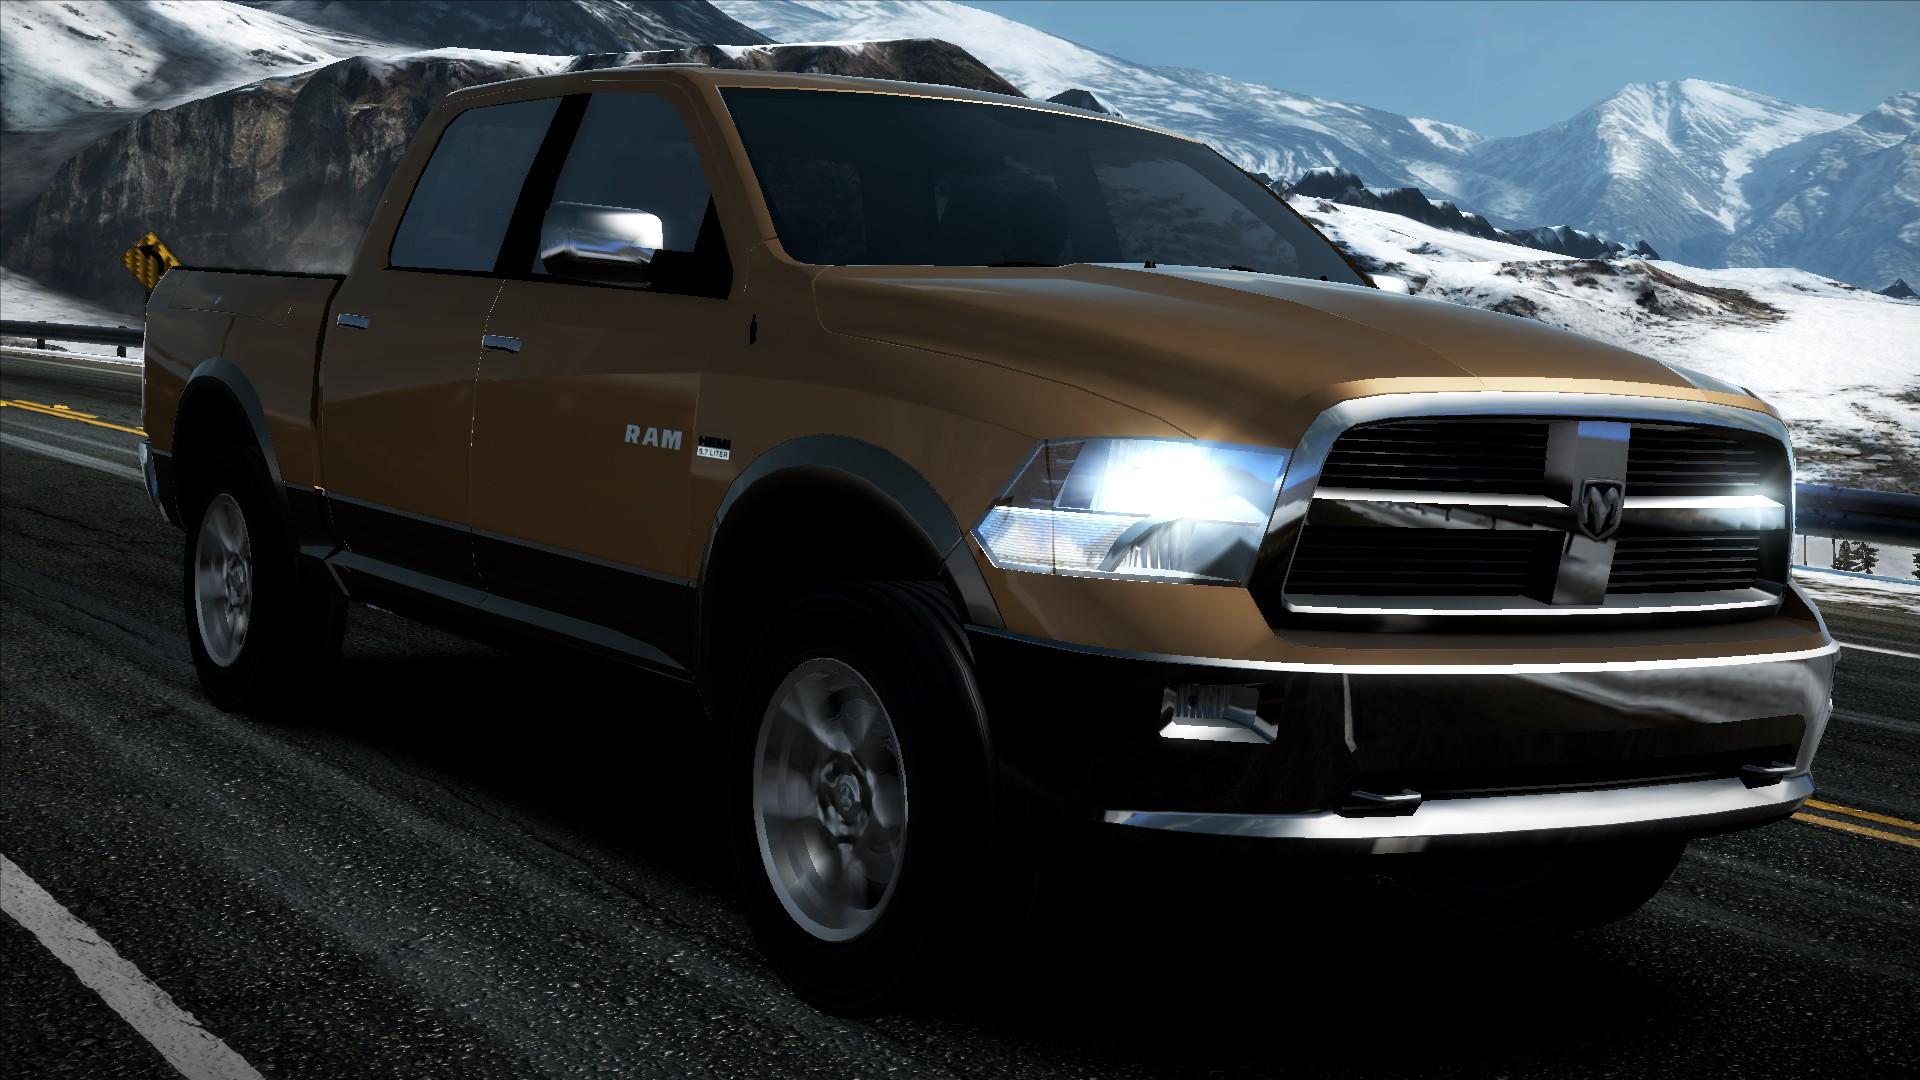 Dodge Ram 1500 Laramie (DS)